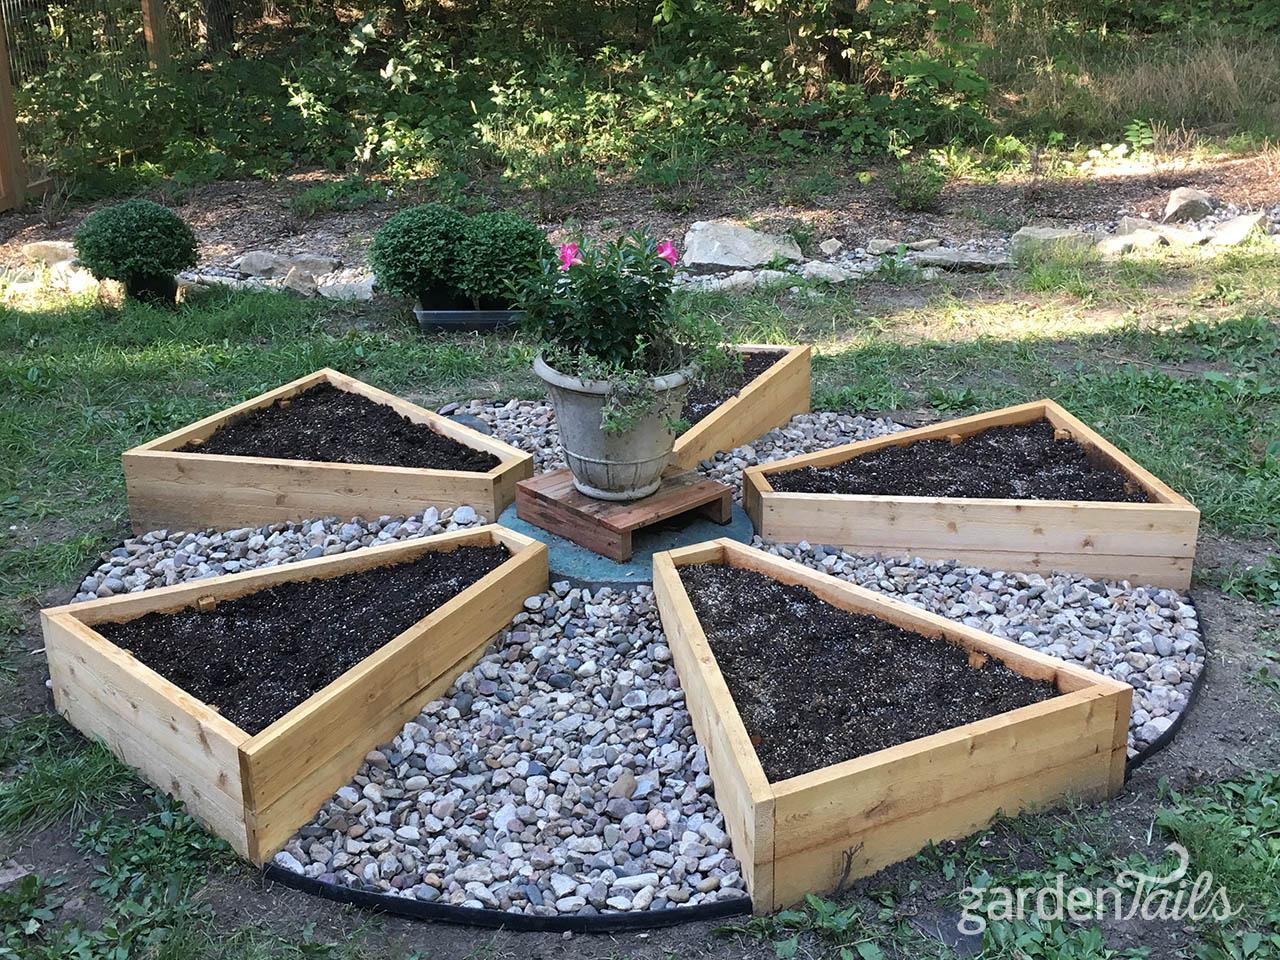 Late Summer Project Raised Garden Beds Gardentails